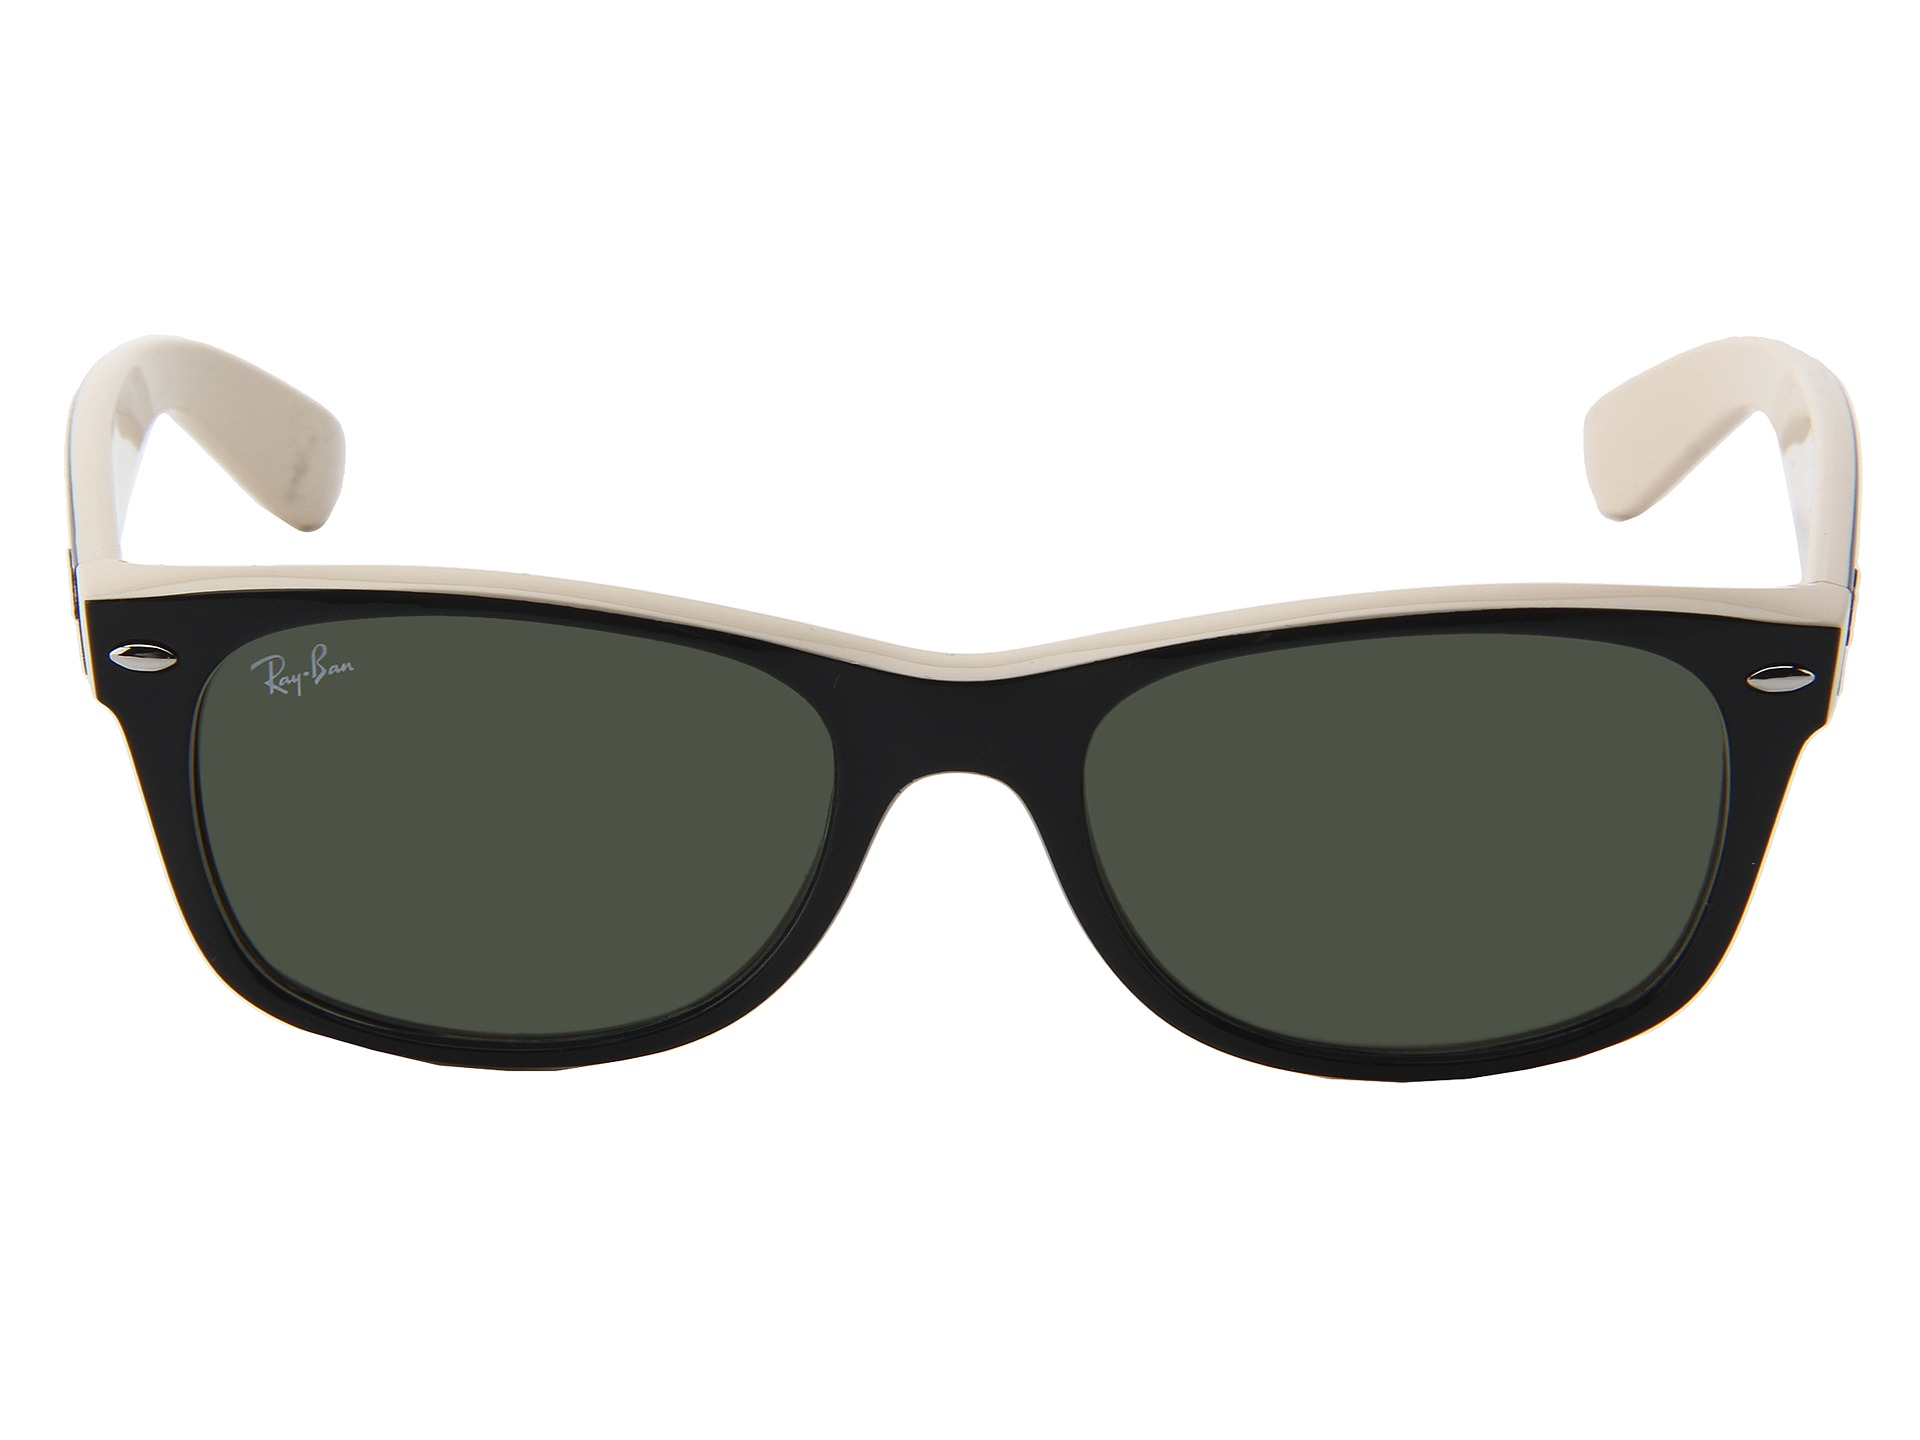 Ray ban sunglasses for couple - Ray Ban Sunglasses For Couple 58